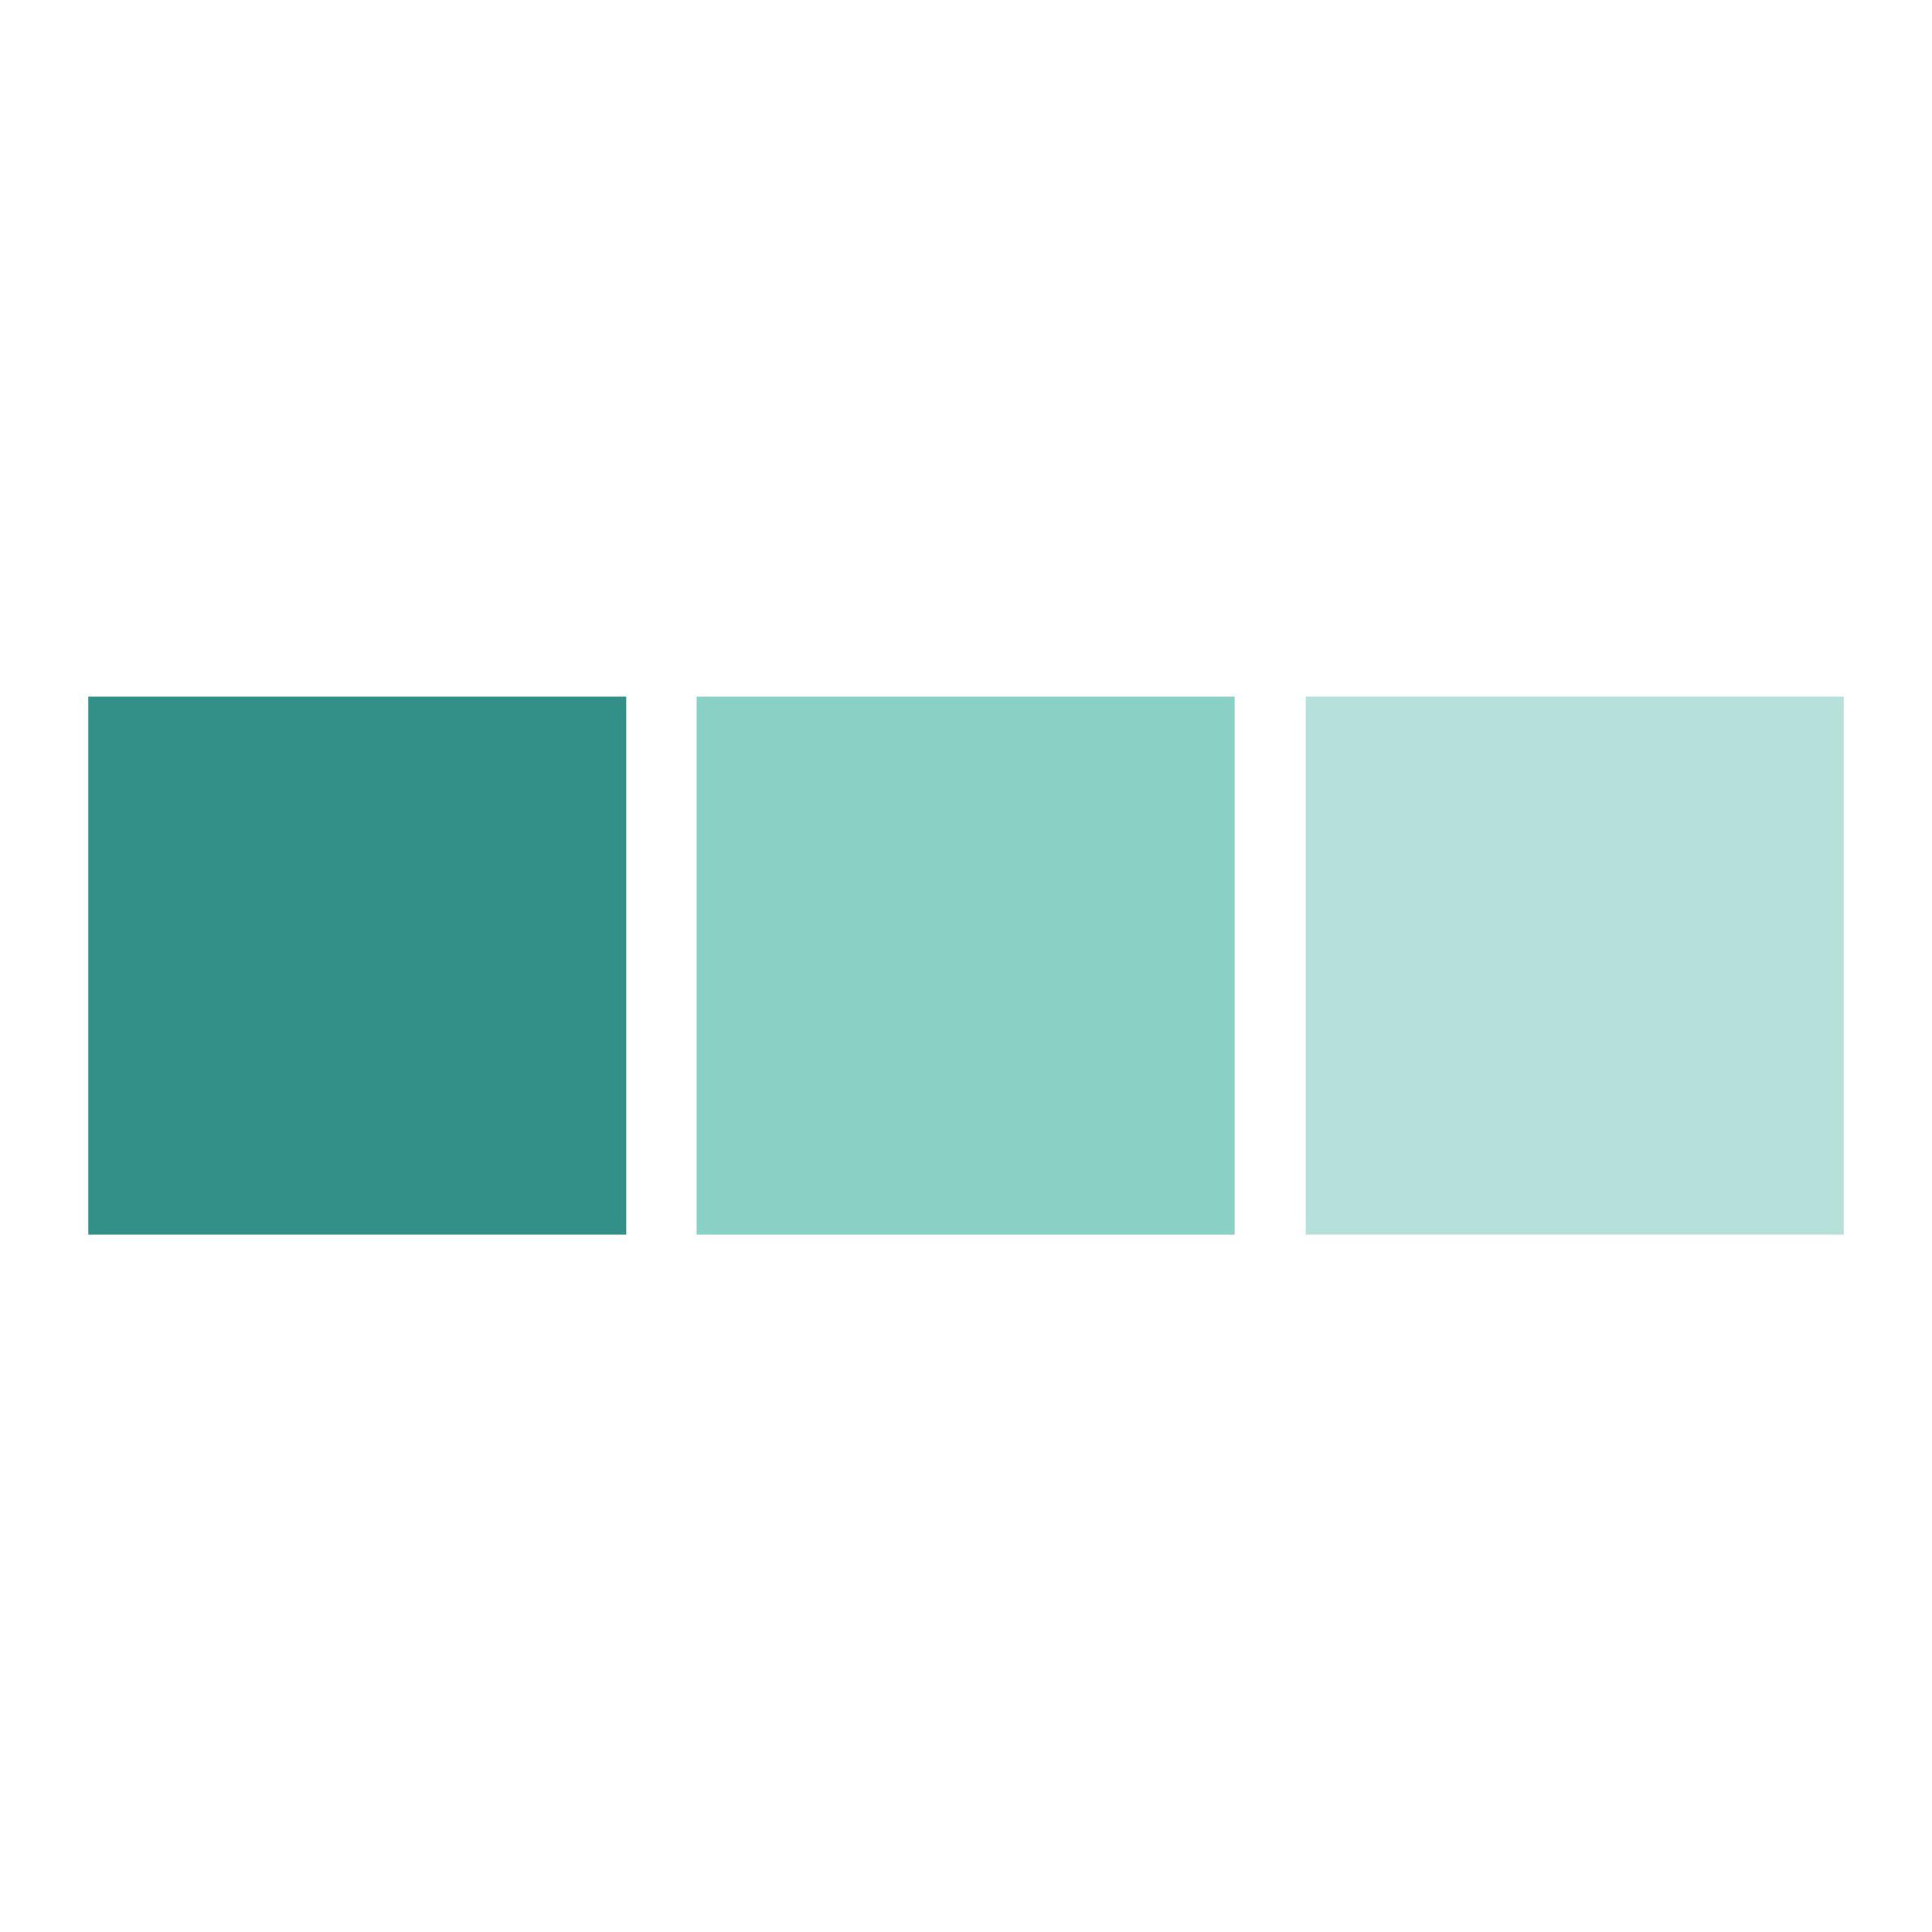 Project status icon